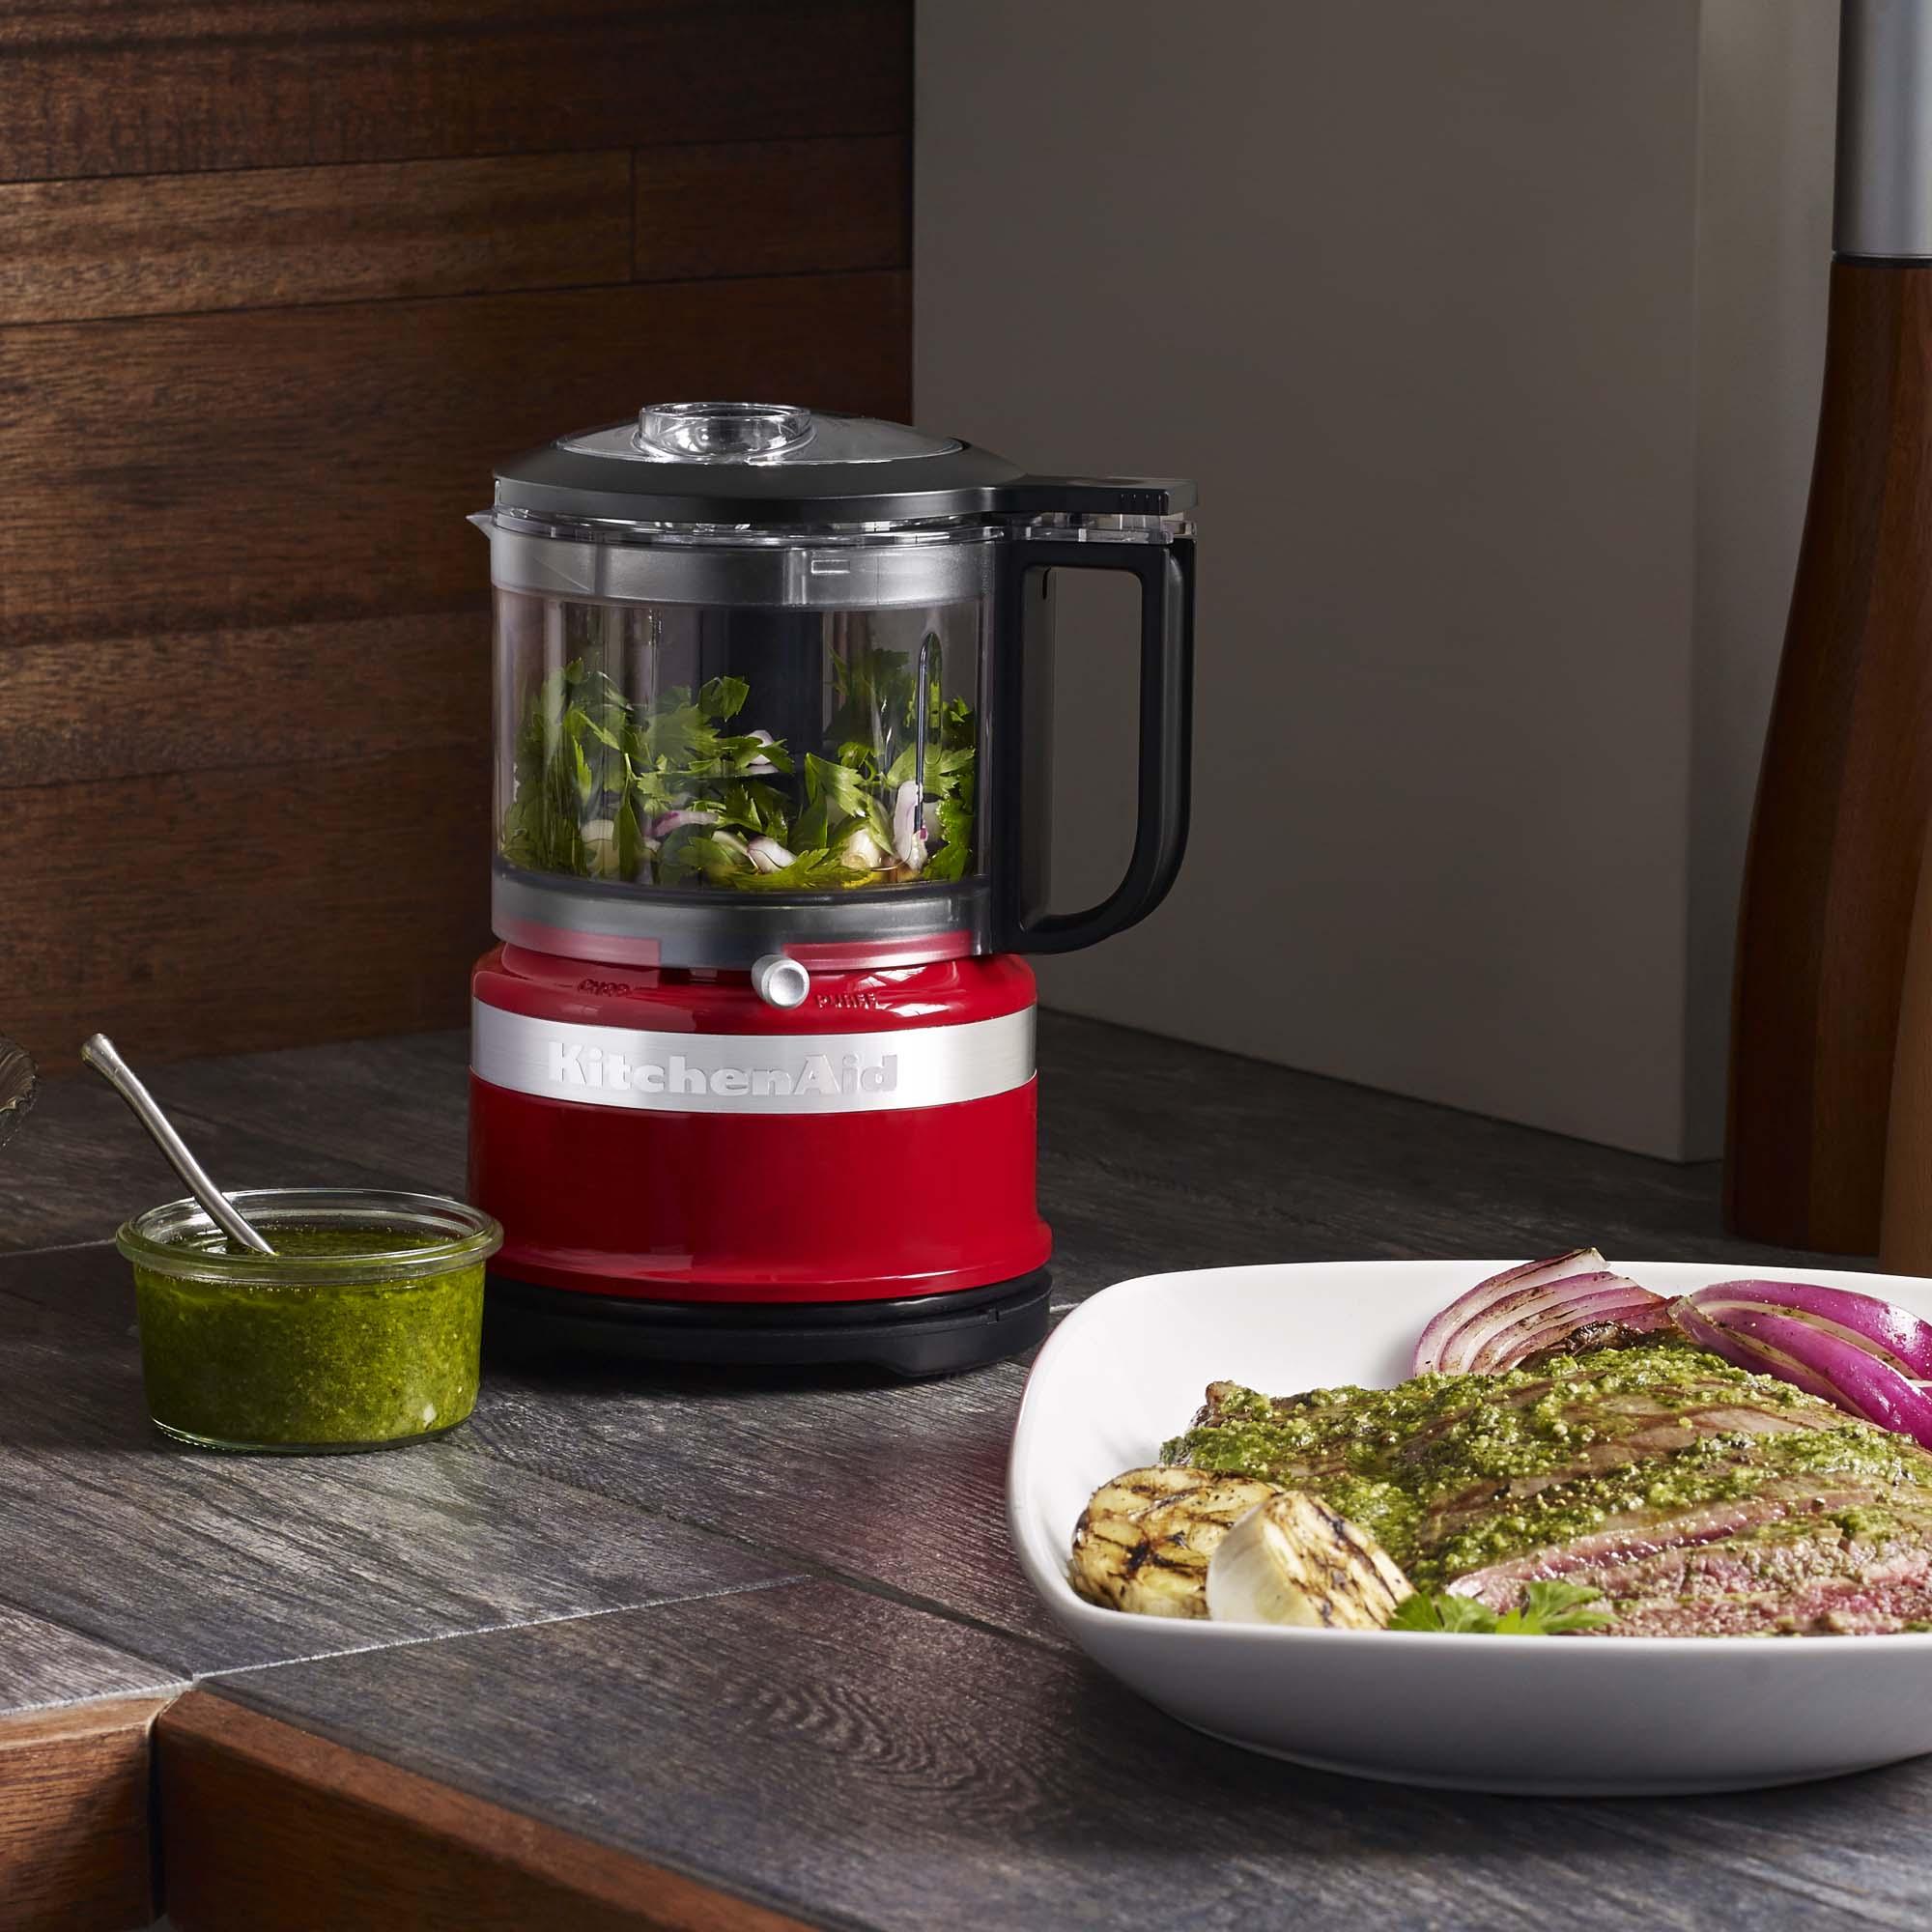 KitchenAid-Refurbished-3-5-Cup-Food-Chopper-RKFC3516 thumbnail 12